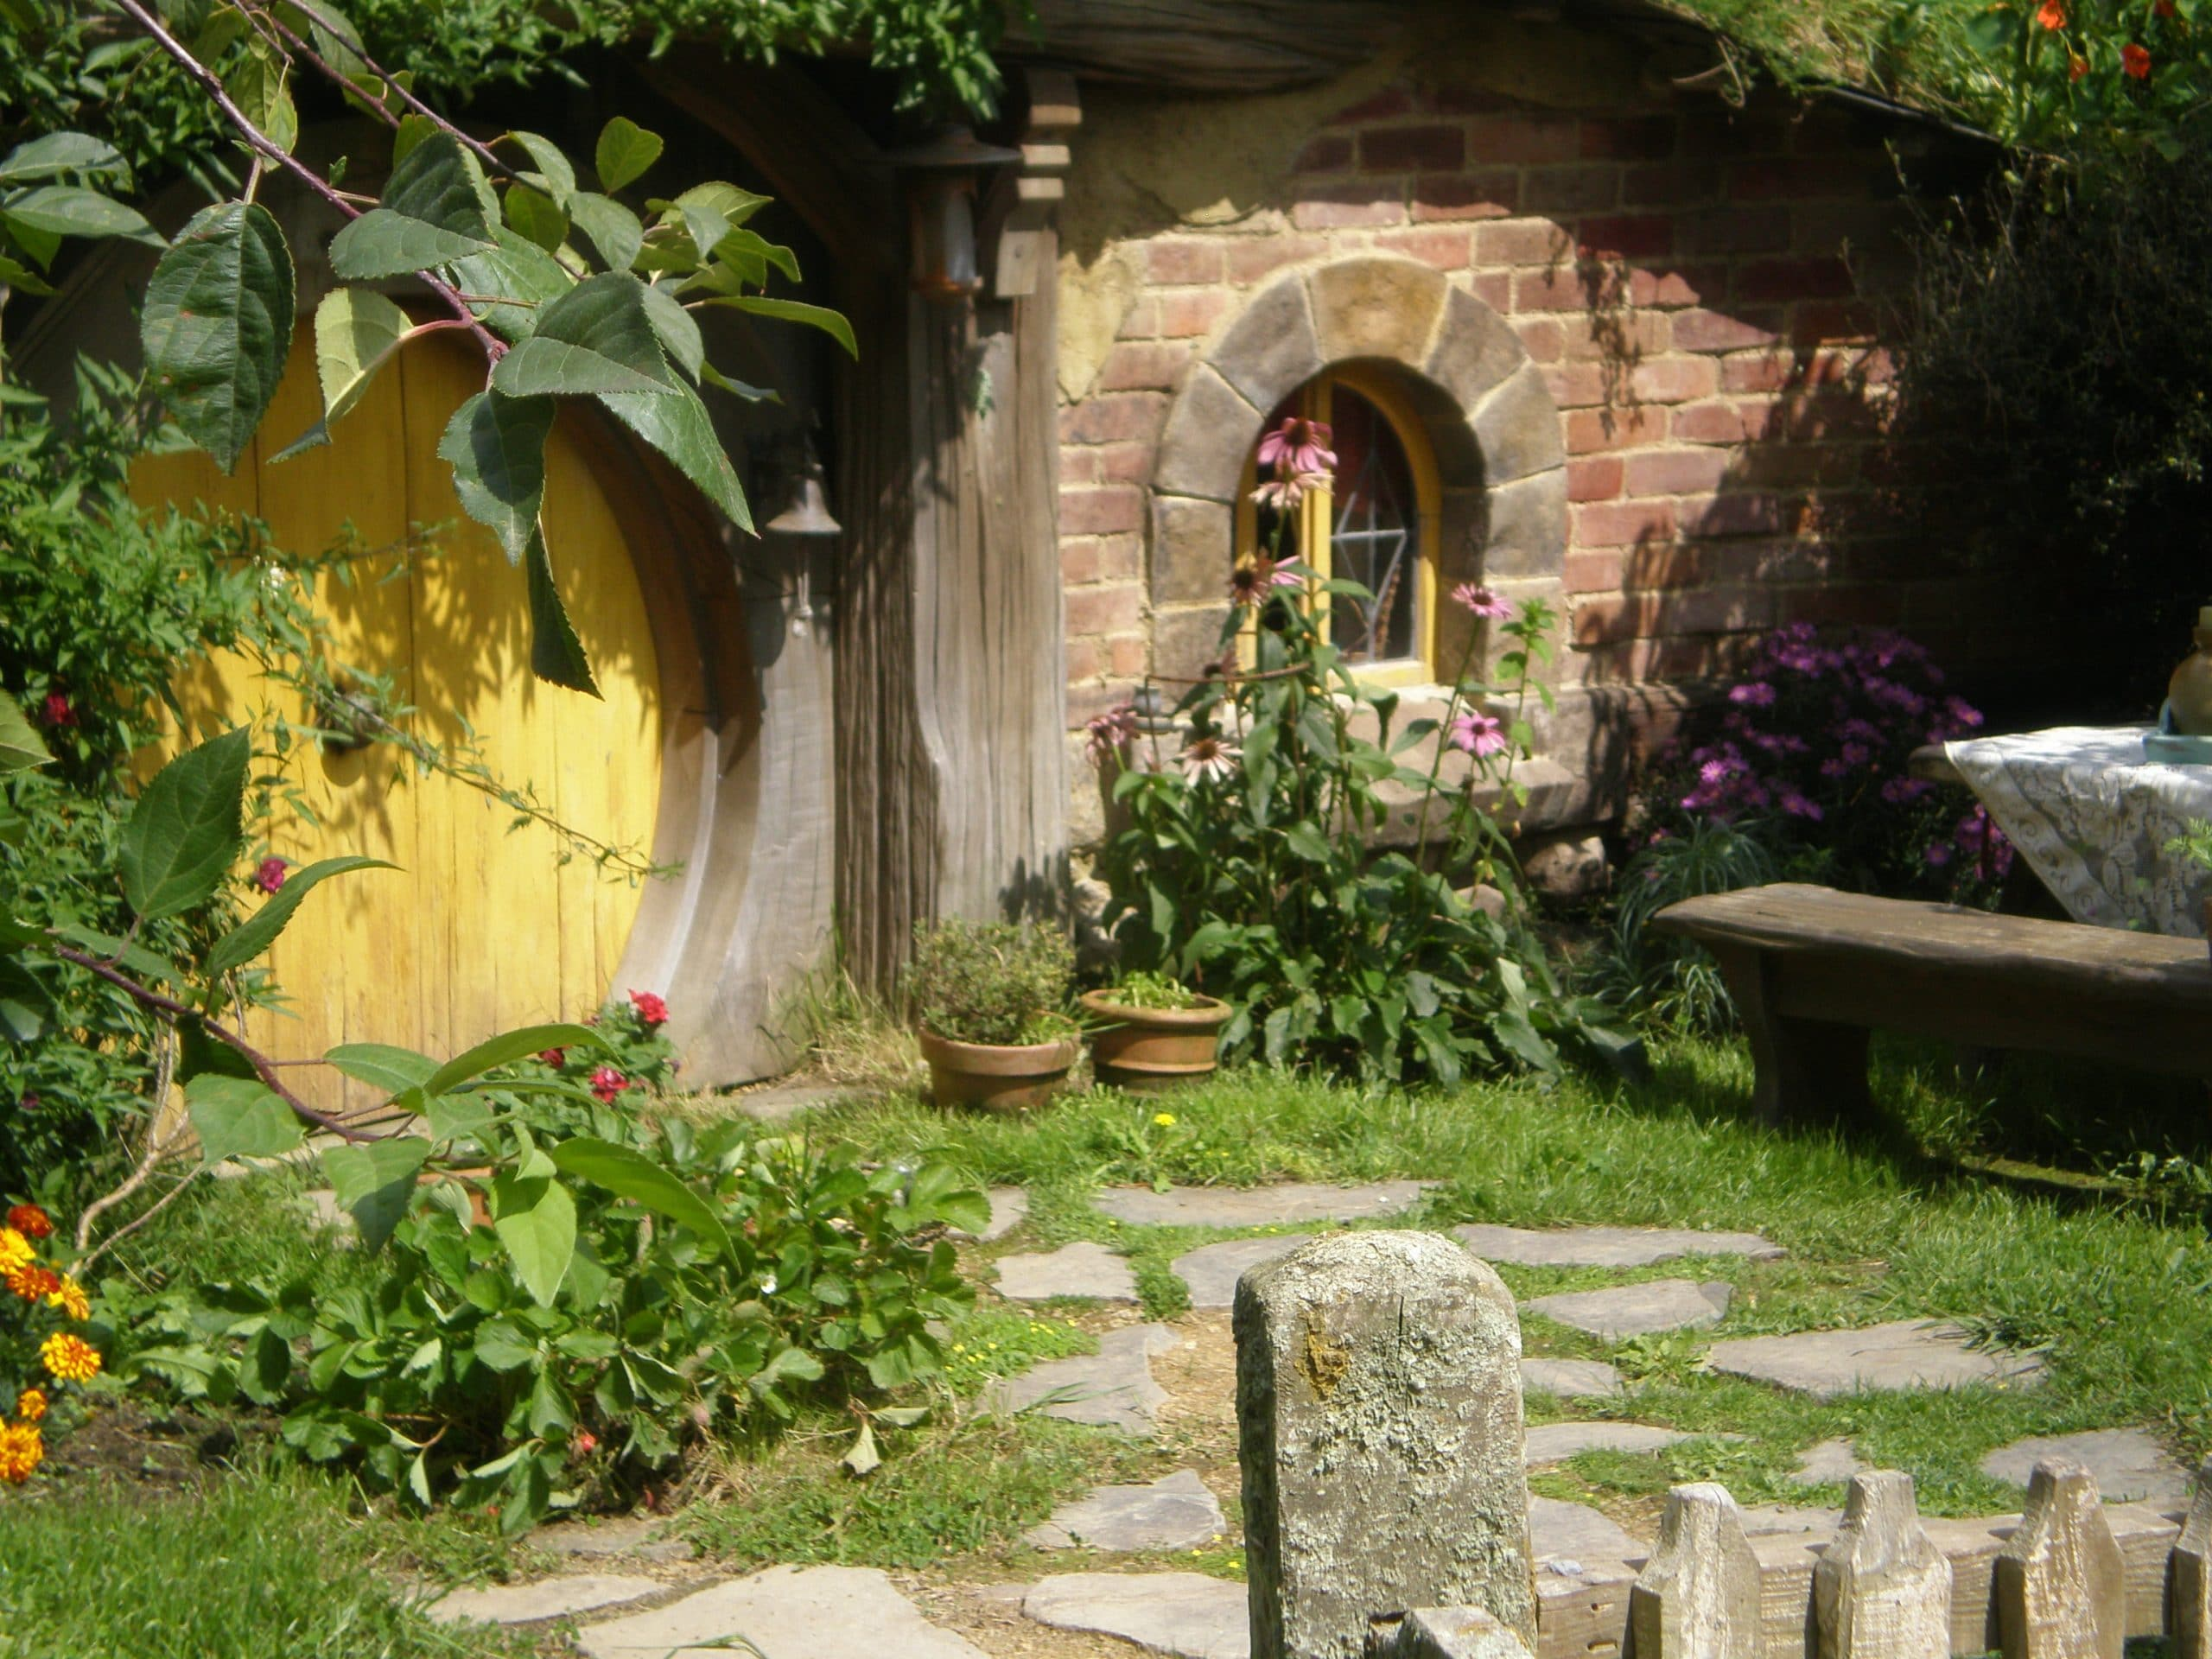 echinacea herb grown by hobbits